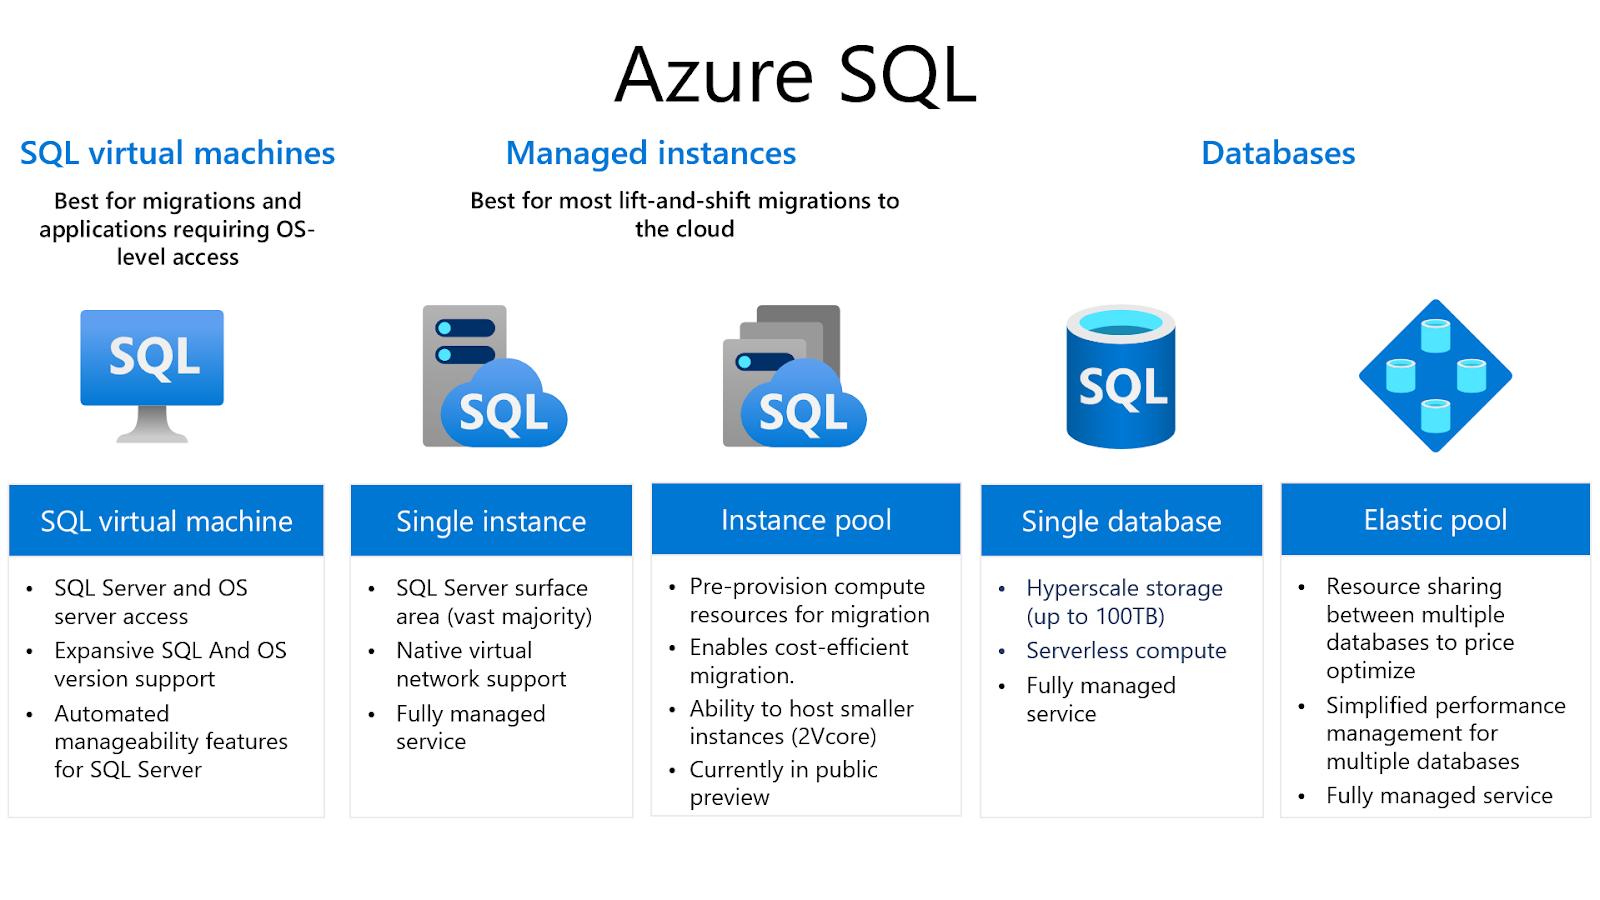 Azure SQL Deployment Options